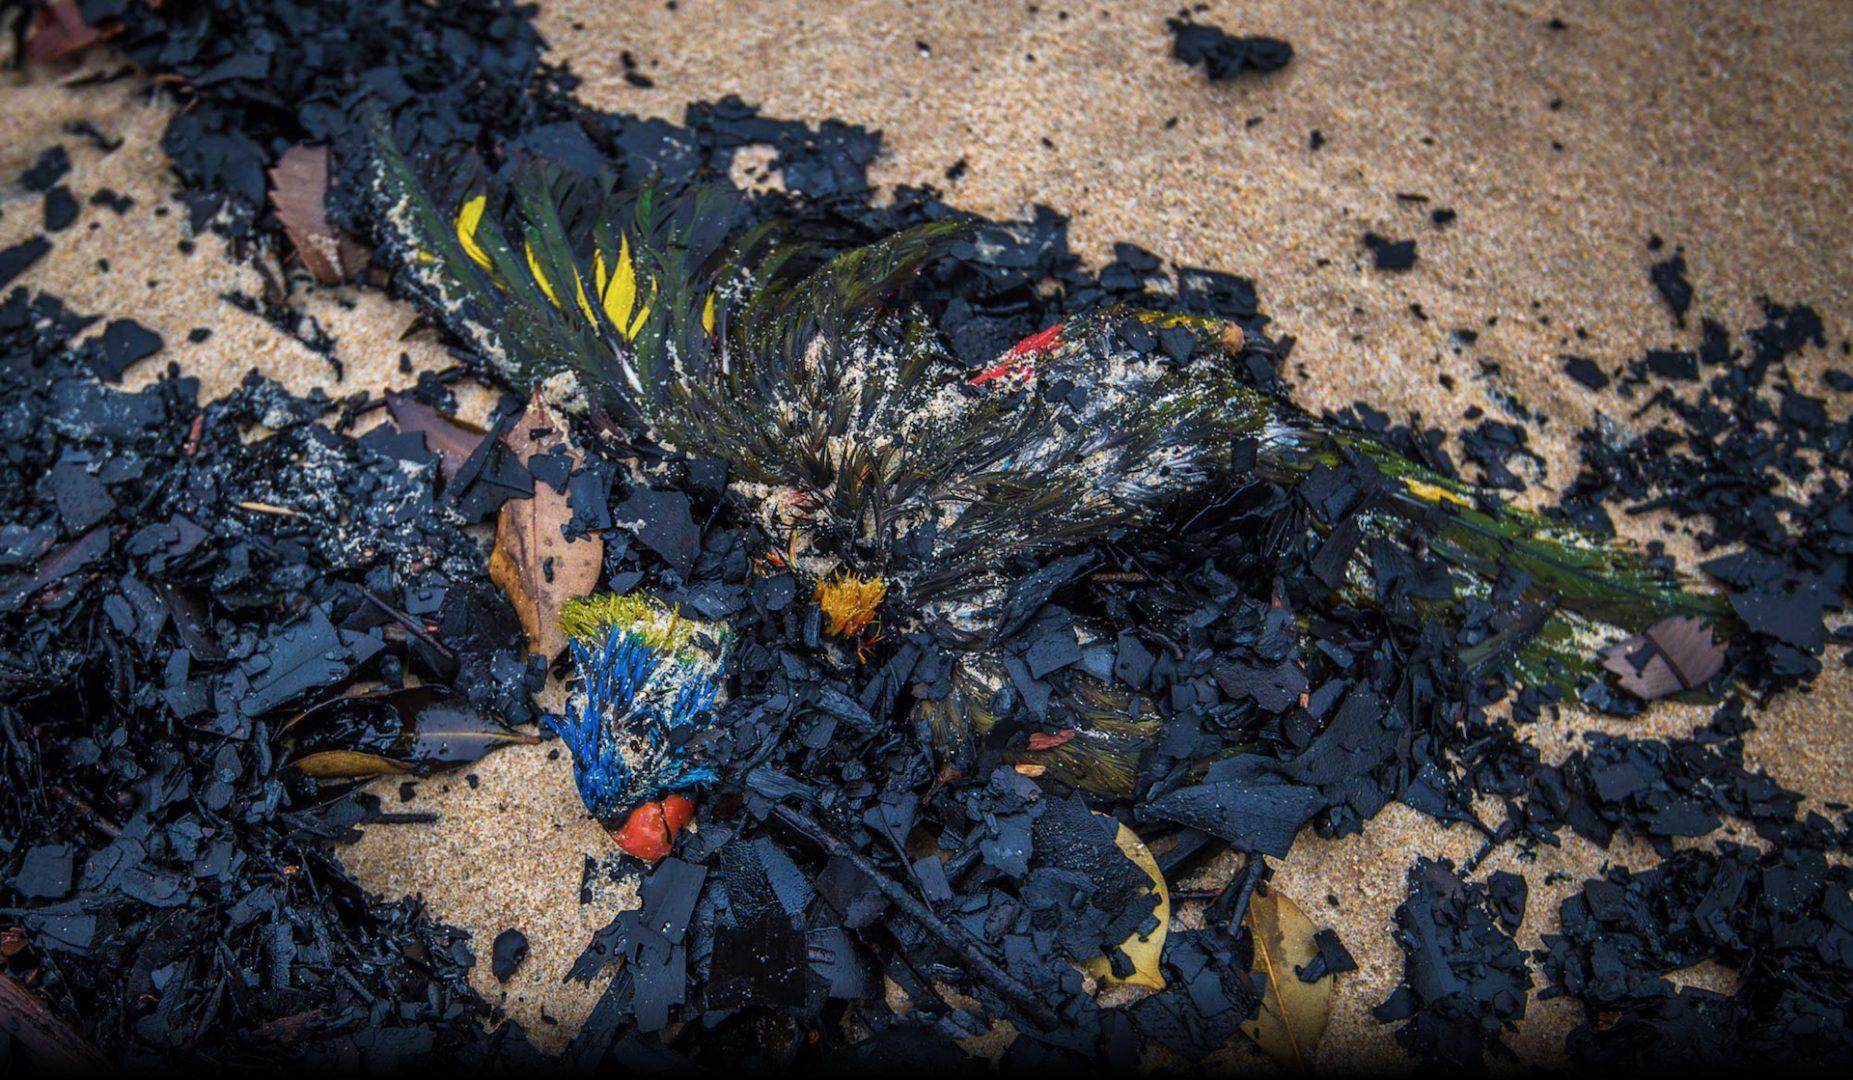 Thousands of birds, like this Rainbow Lorikeet, washed up dead  amongst charcoal on Mallacoota beach, January 2020. Photo: Justin McManus.